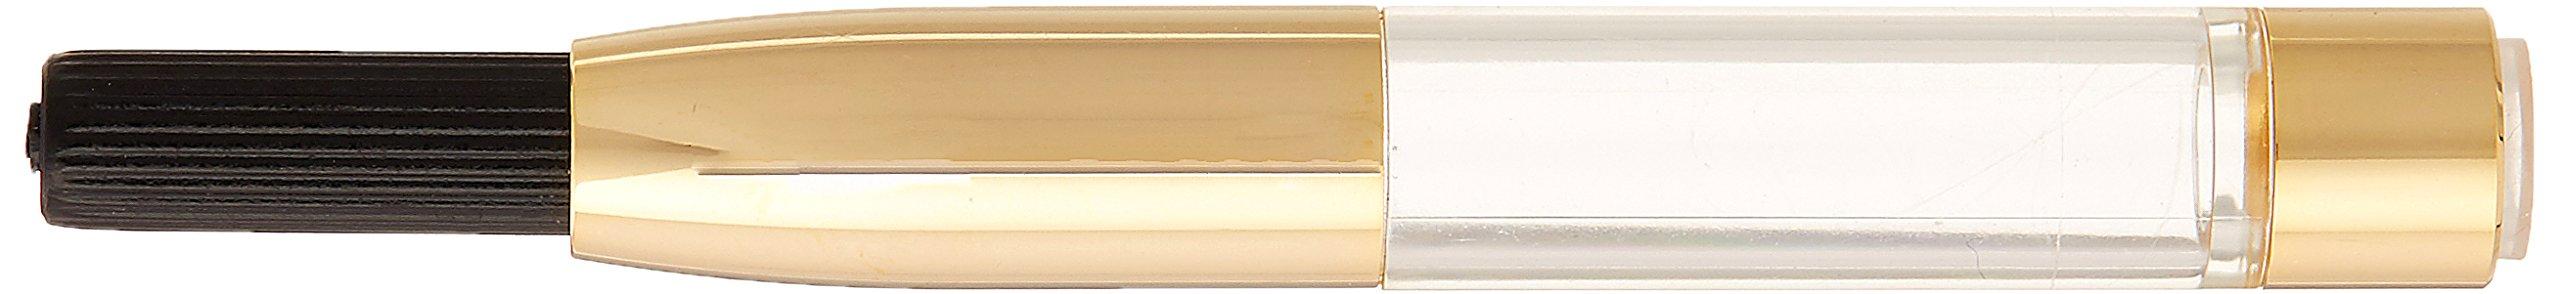 Platinum Converter for Fountain Pen (CONVERTER-500)